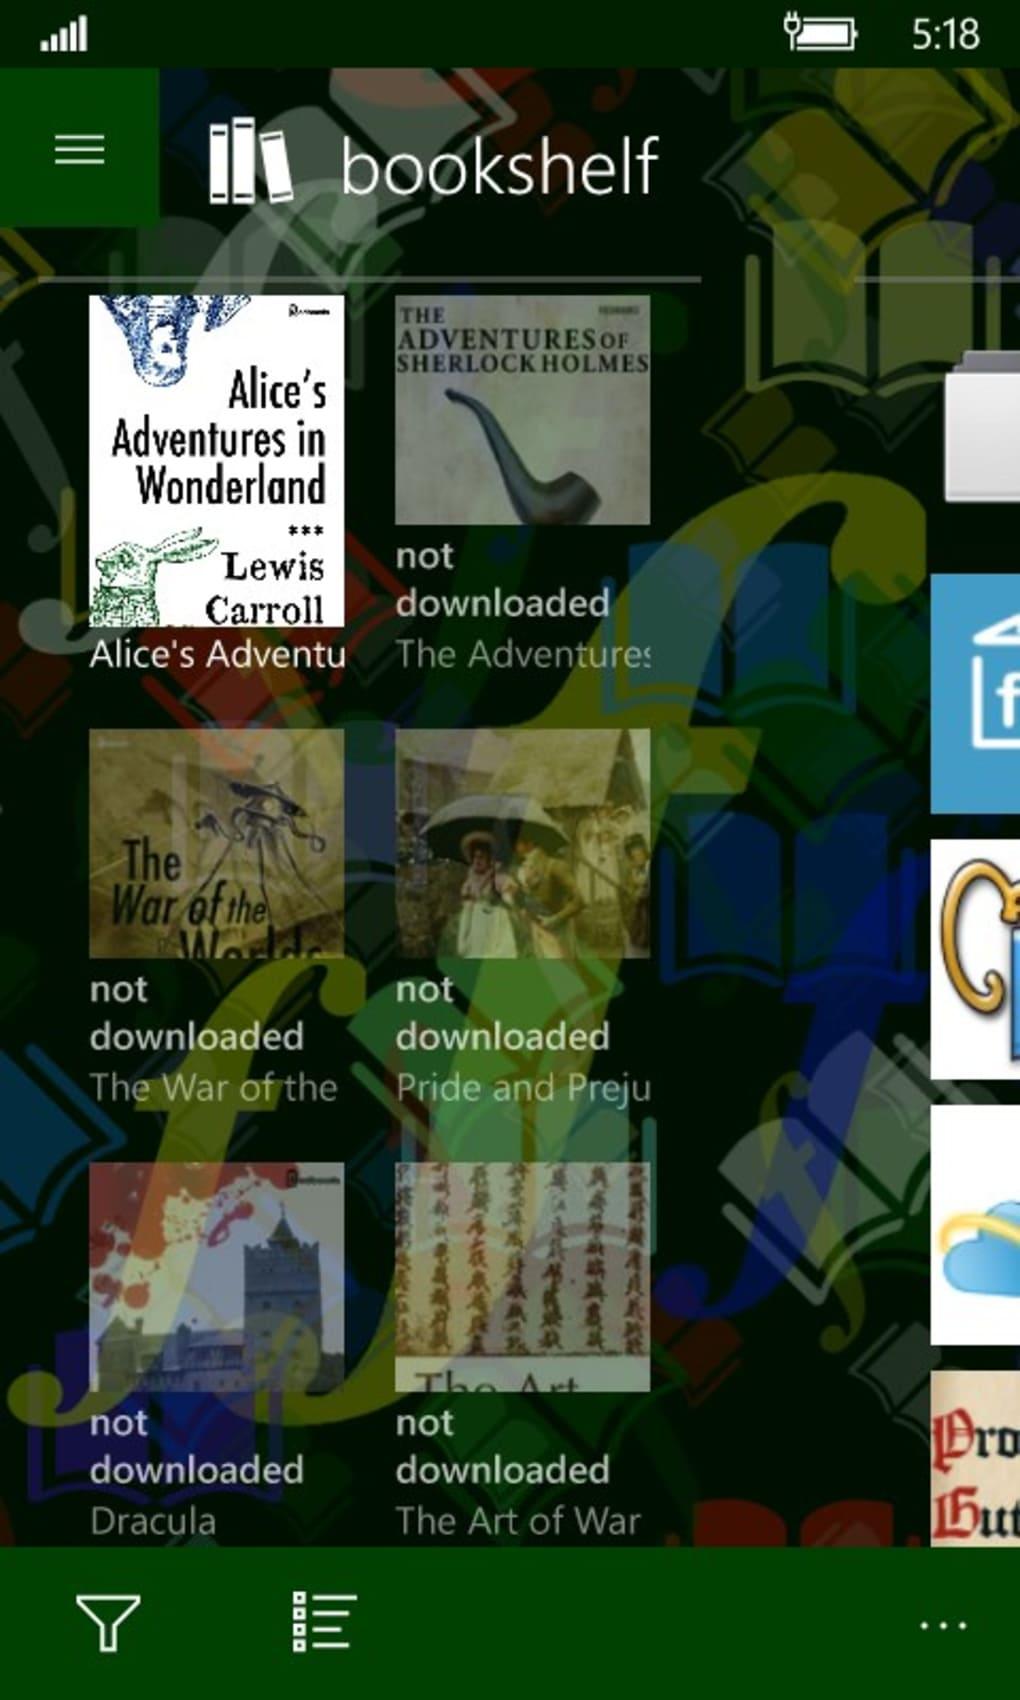 Wonderland alices epub download in adventures